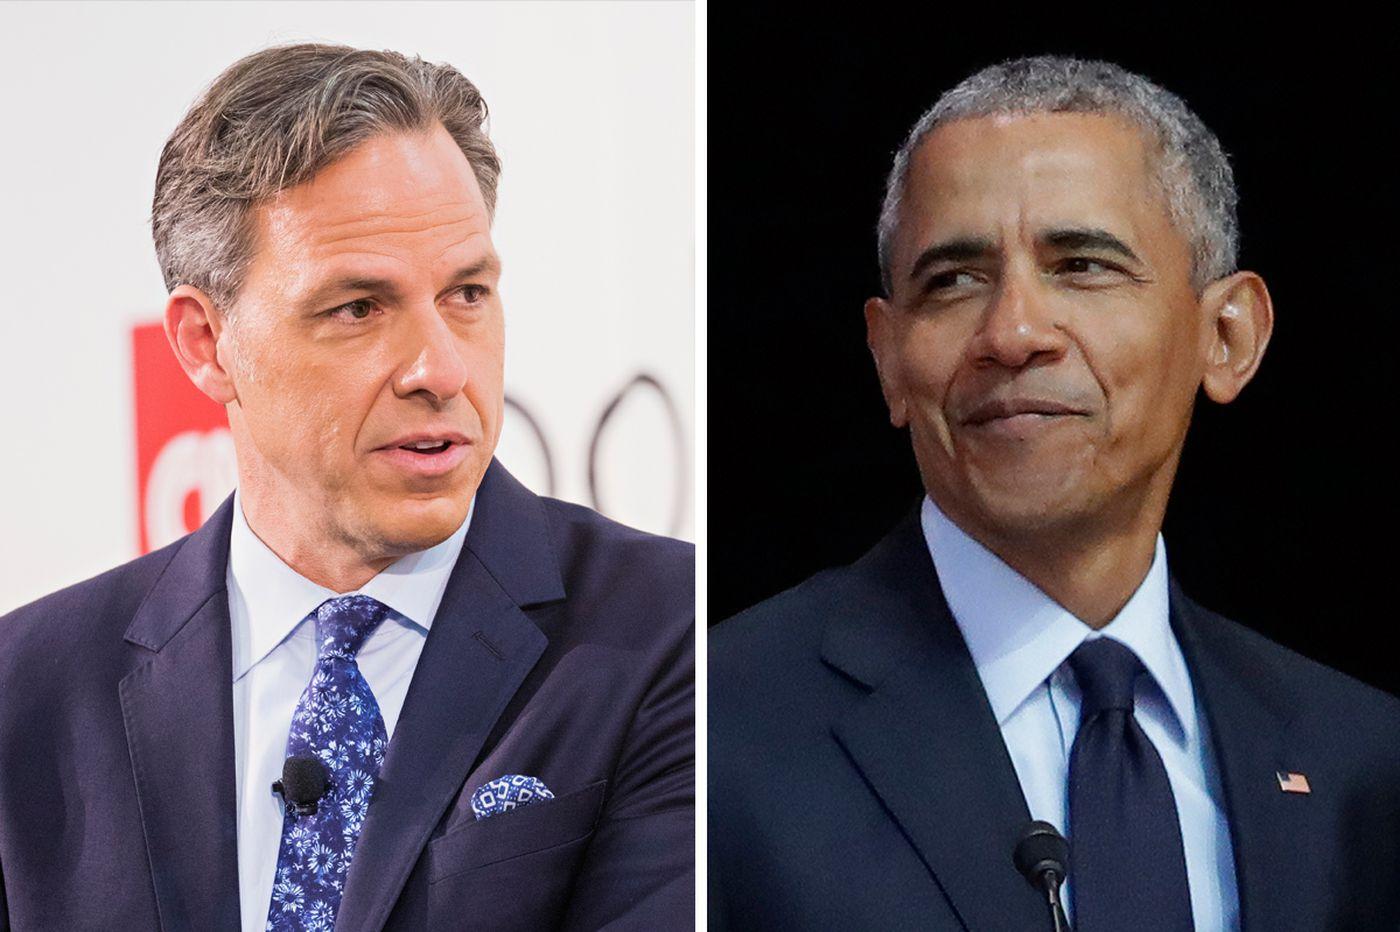 CNN's Jake Tapper jabs Obama after appearance at Beyonce and Jay-Z concert